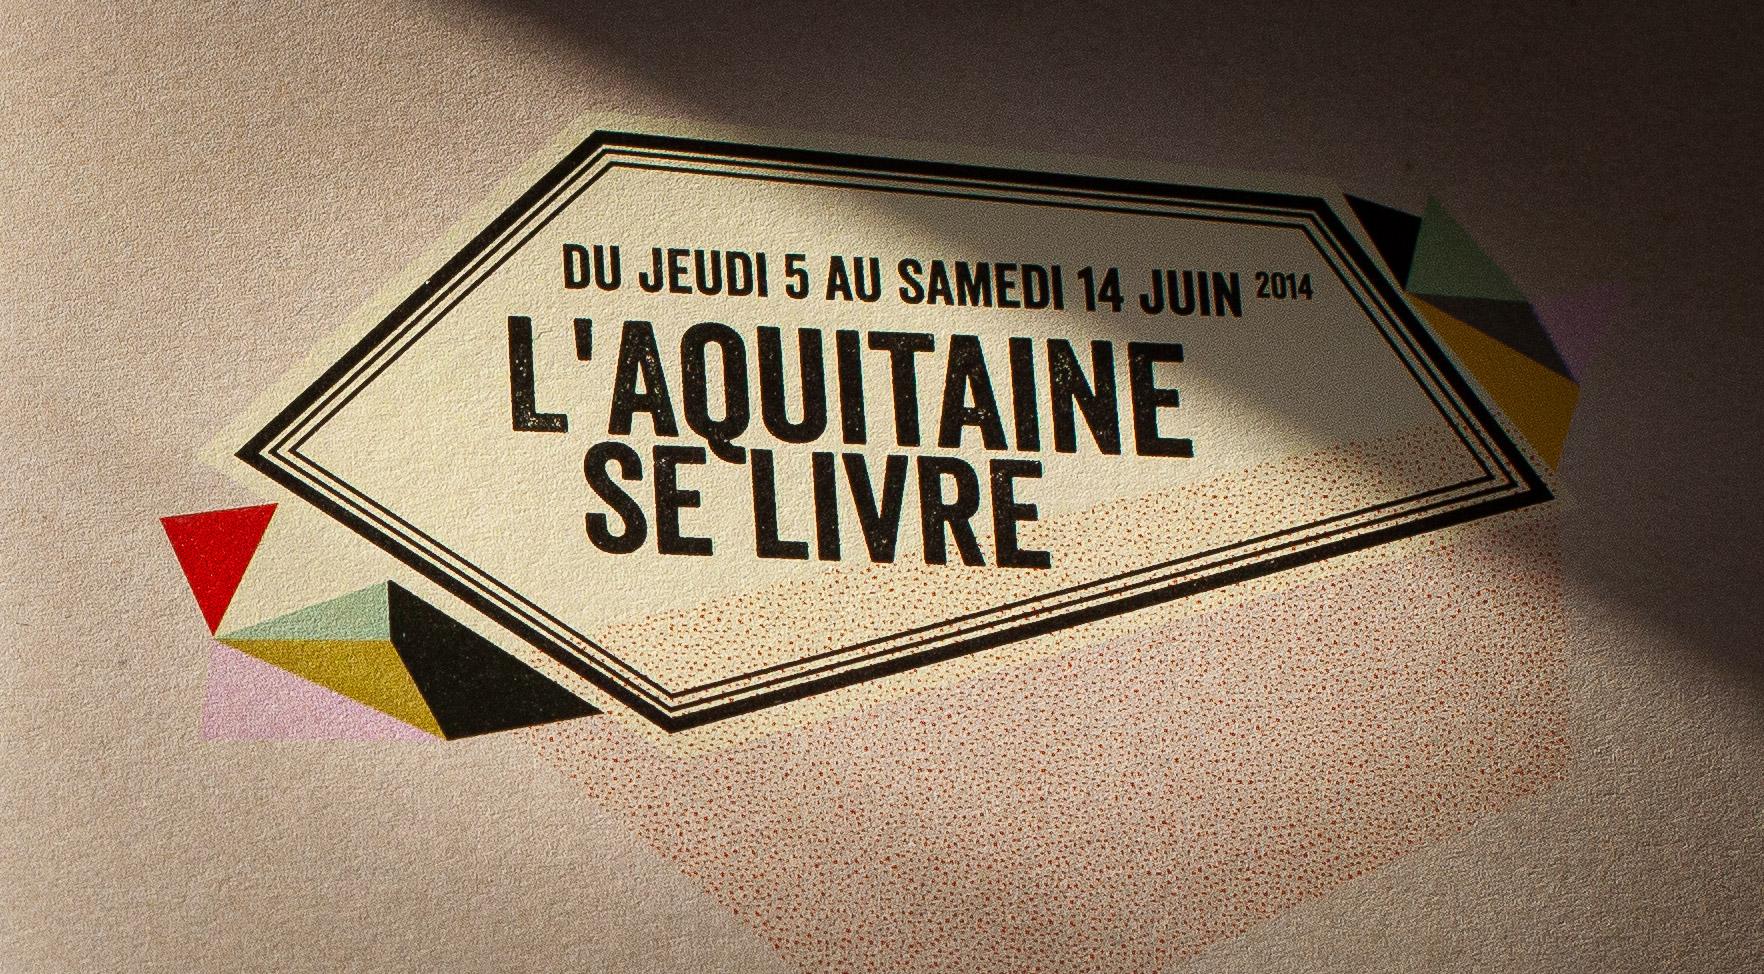 L'Aquitaine se livre